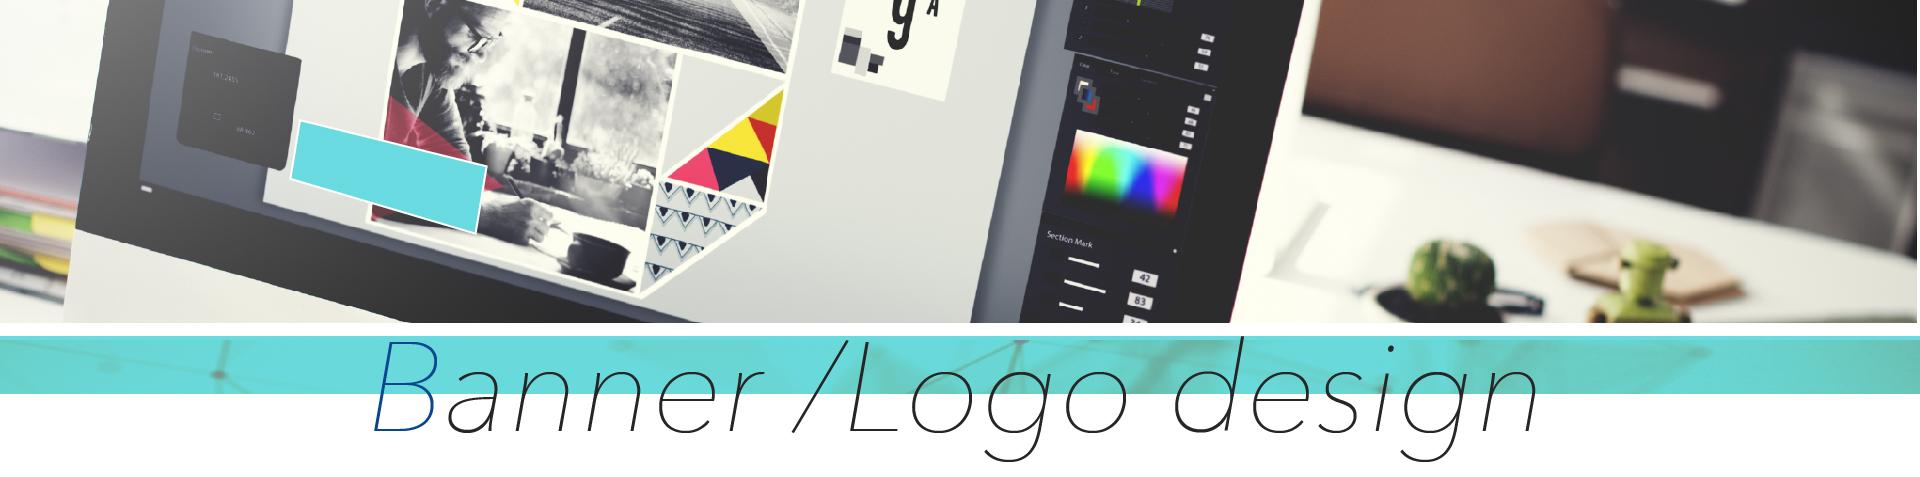 banner_logo_design